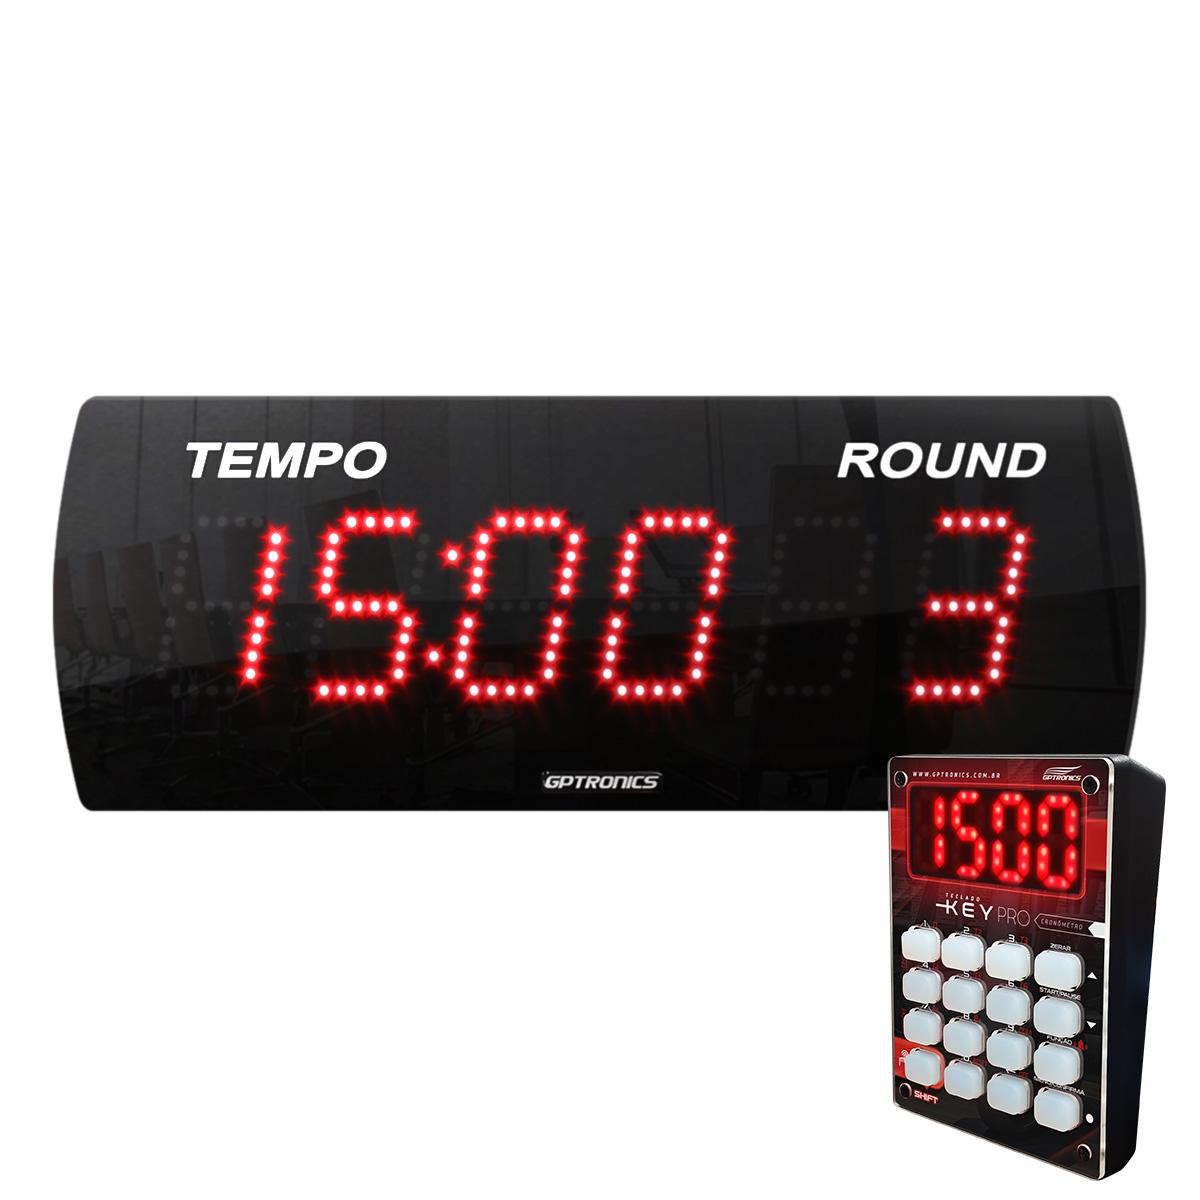 Painel Relógio Cronômetro LEDTime 625 N - com Teclado Key Pro - 38x14CM